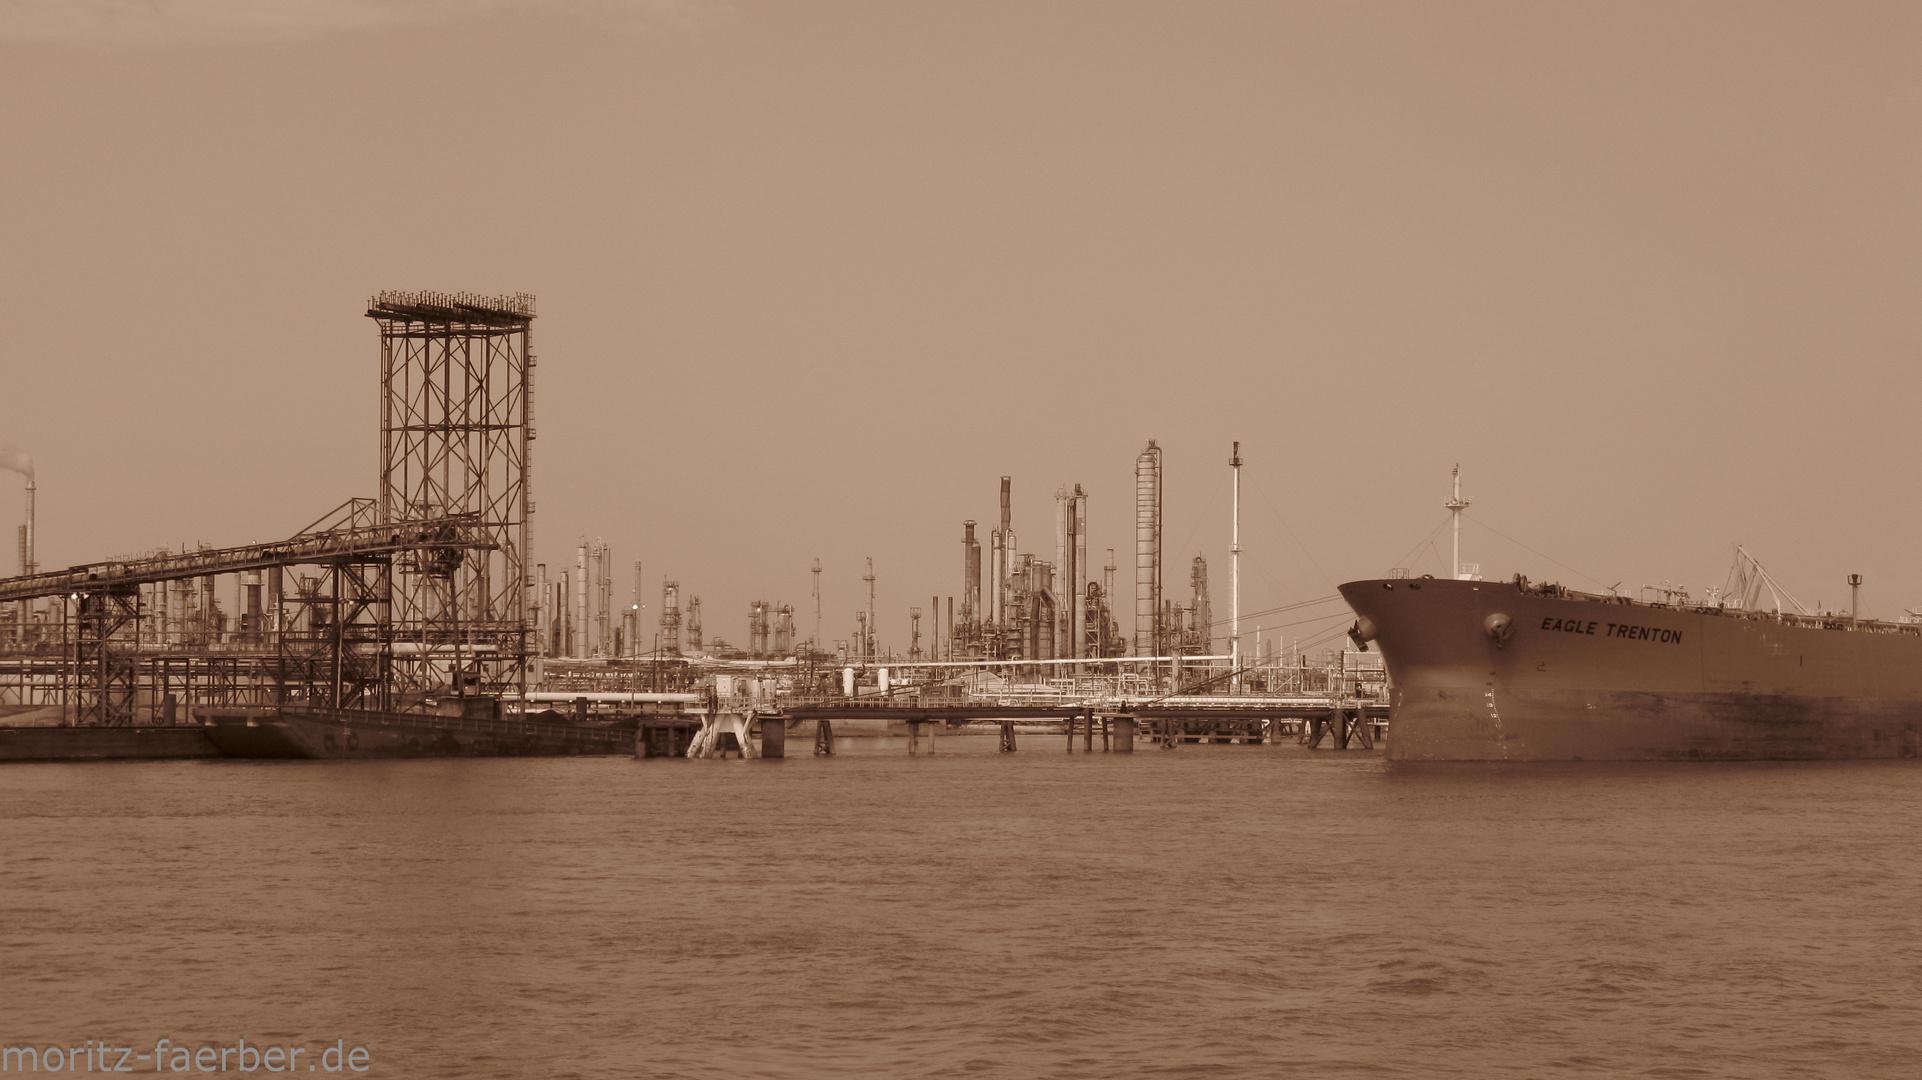 Raffinerie am Mississippi